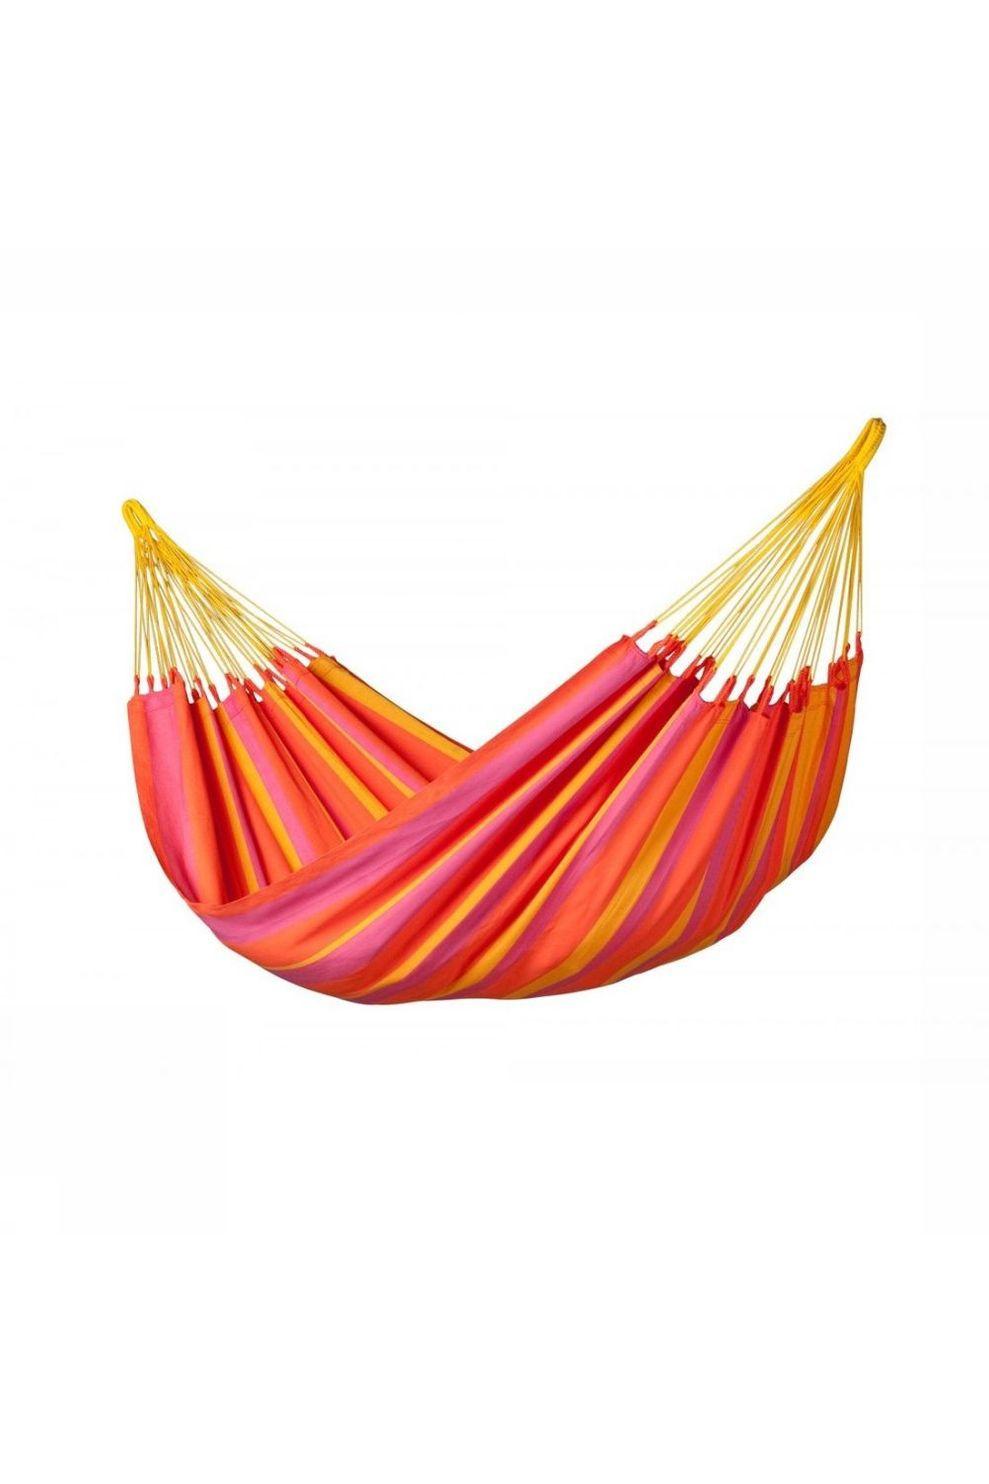 La Siesta Hangmat Sonrisa Single - Oranje/Rood